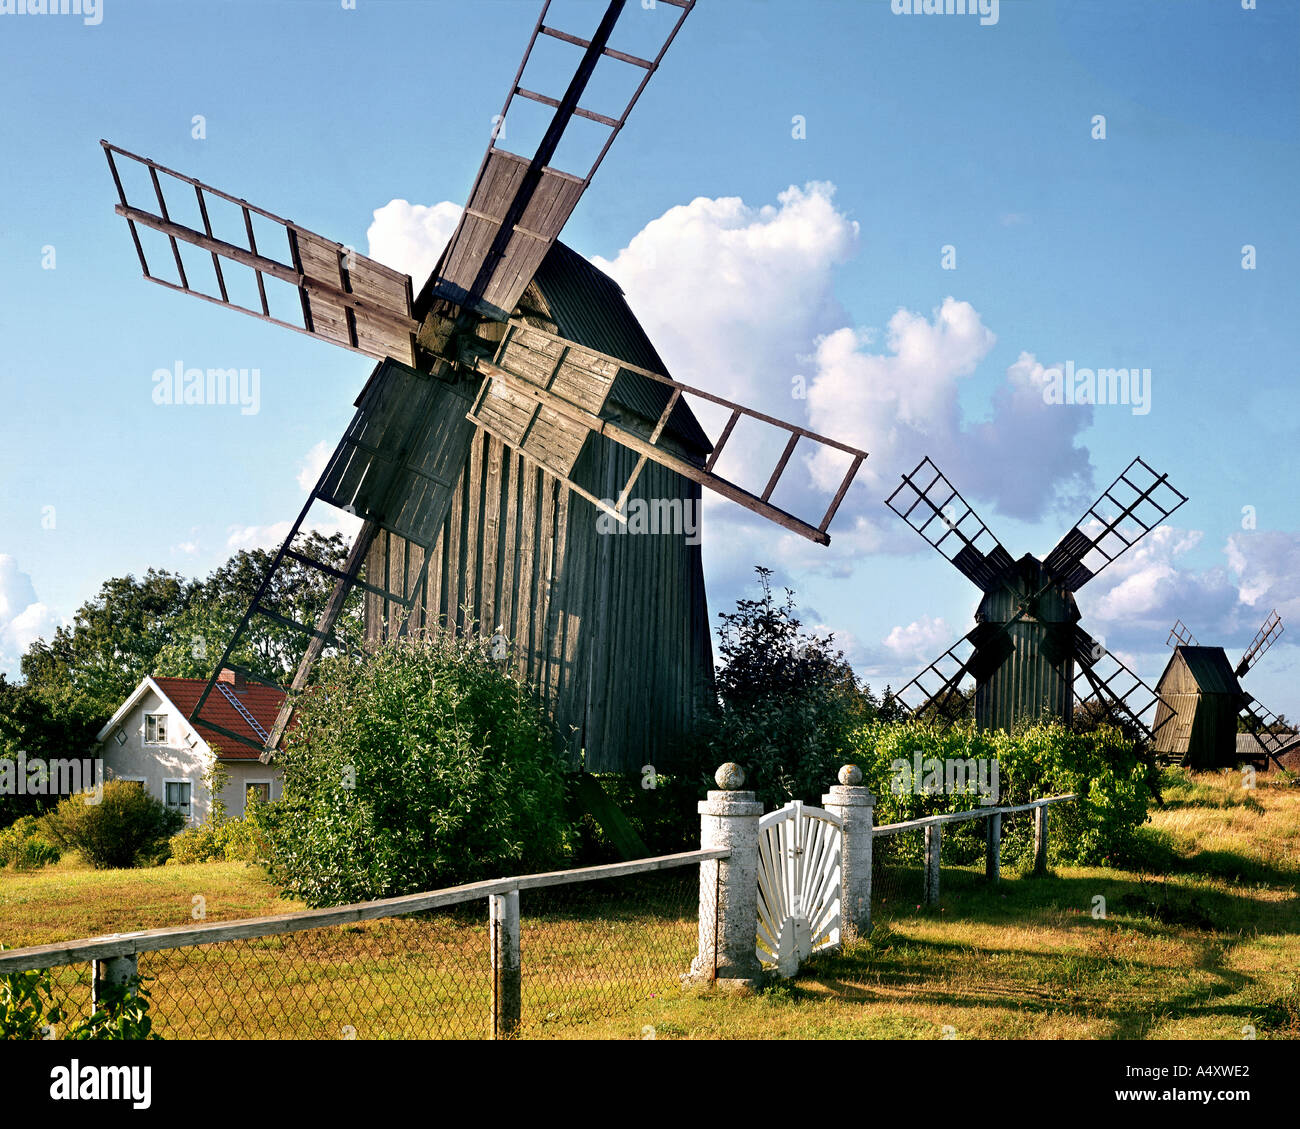 SE -  KALMAR: Windmills on Oland - Stock Image